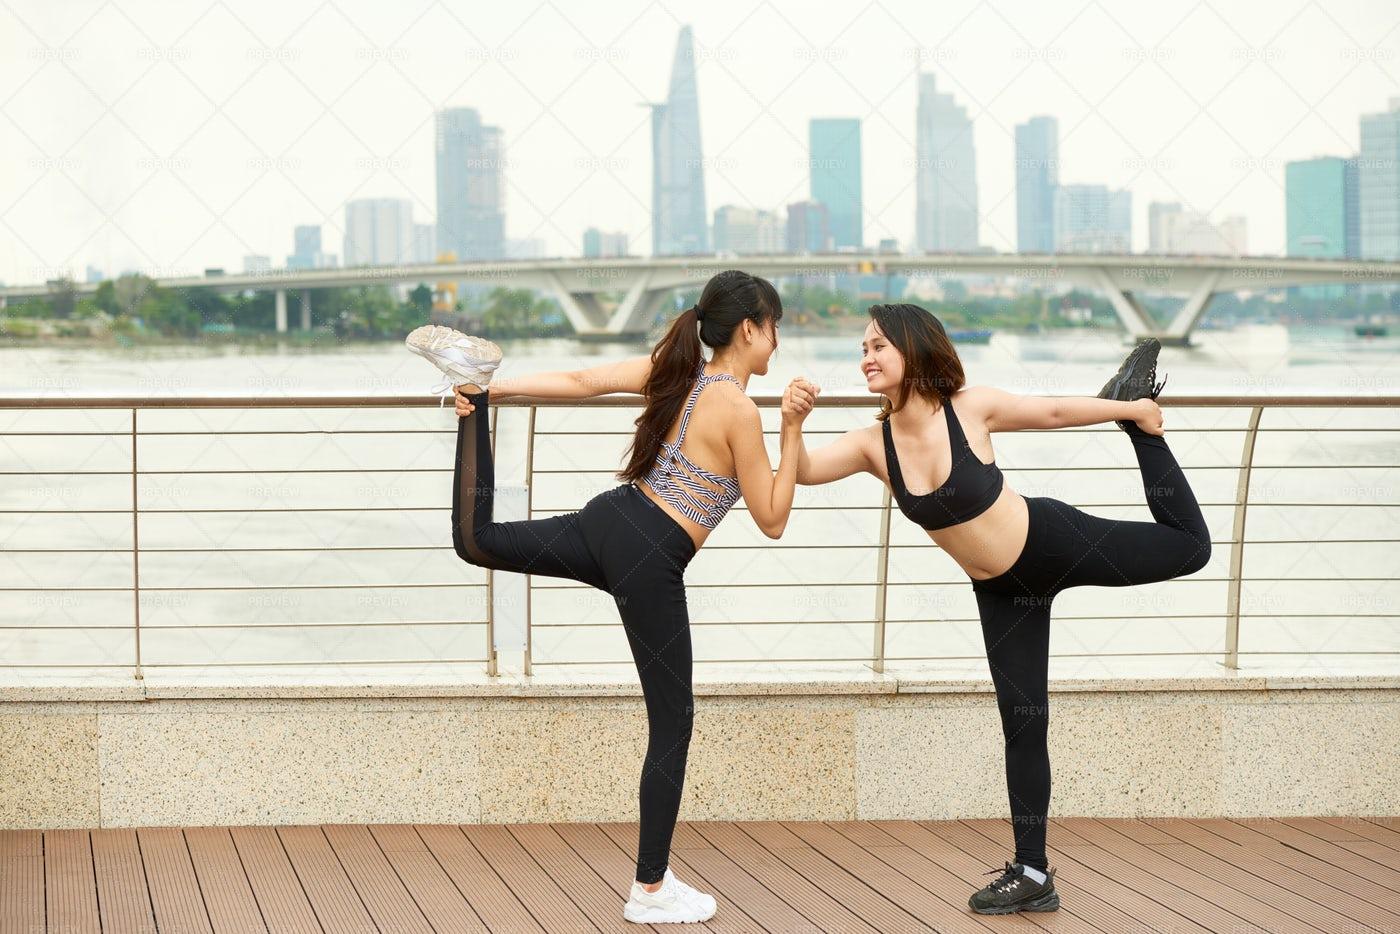 Cheerful Woman Training Yoga Together: Stock Photos